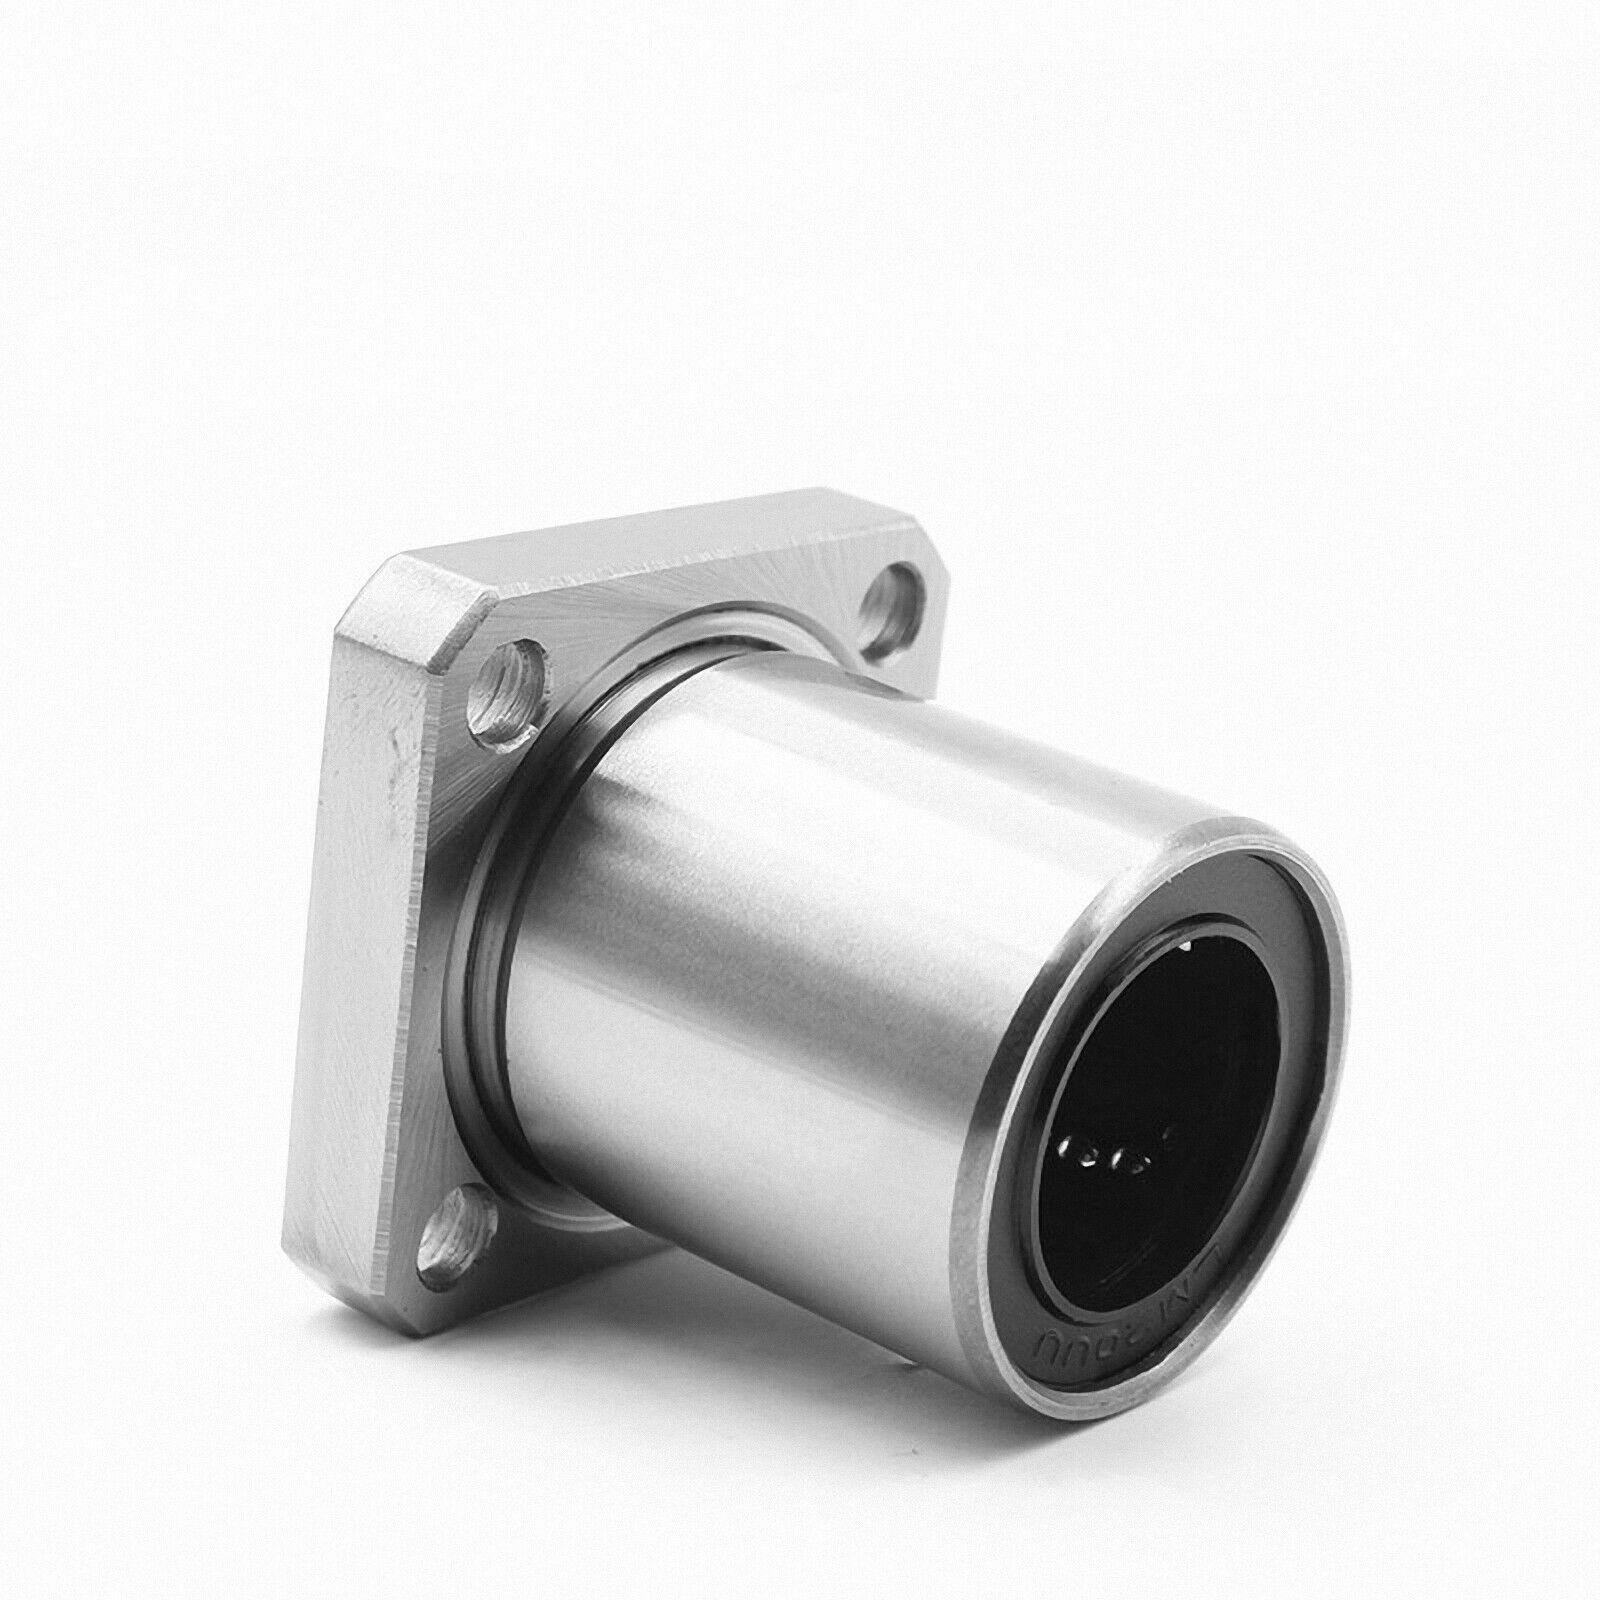 LMK8UU Square Flange Type Linear Bearing Ball Bushing CNC Part